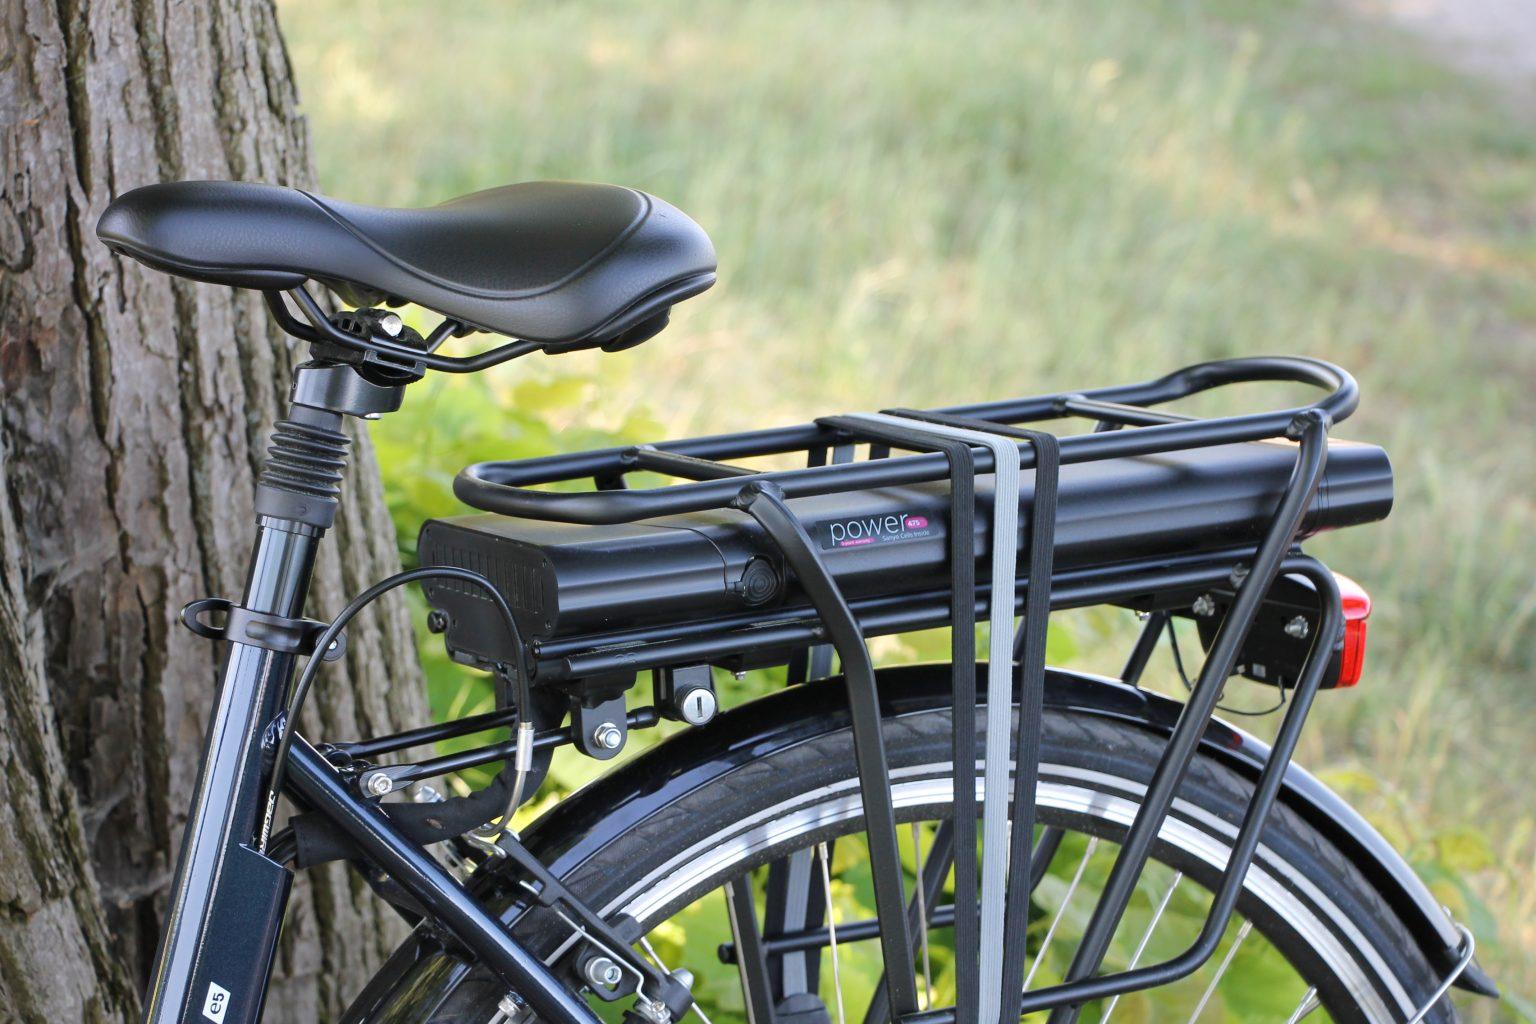 Reichweite Wayscral E-Bikes Test - A.T.U E-Bikes